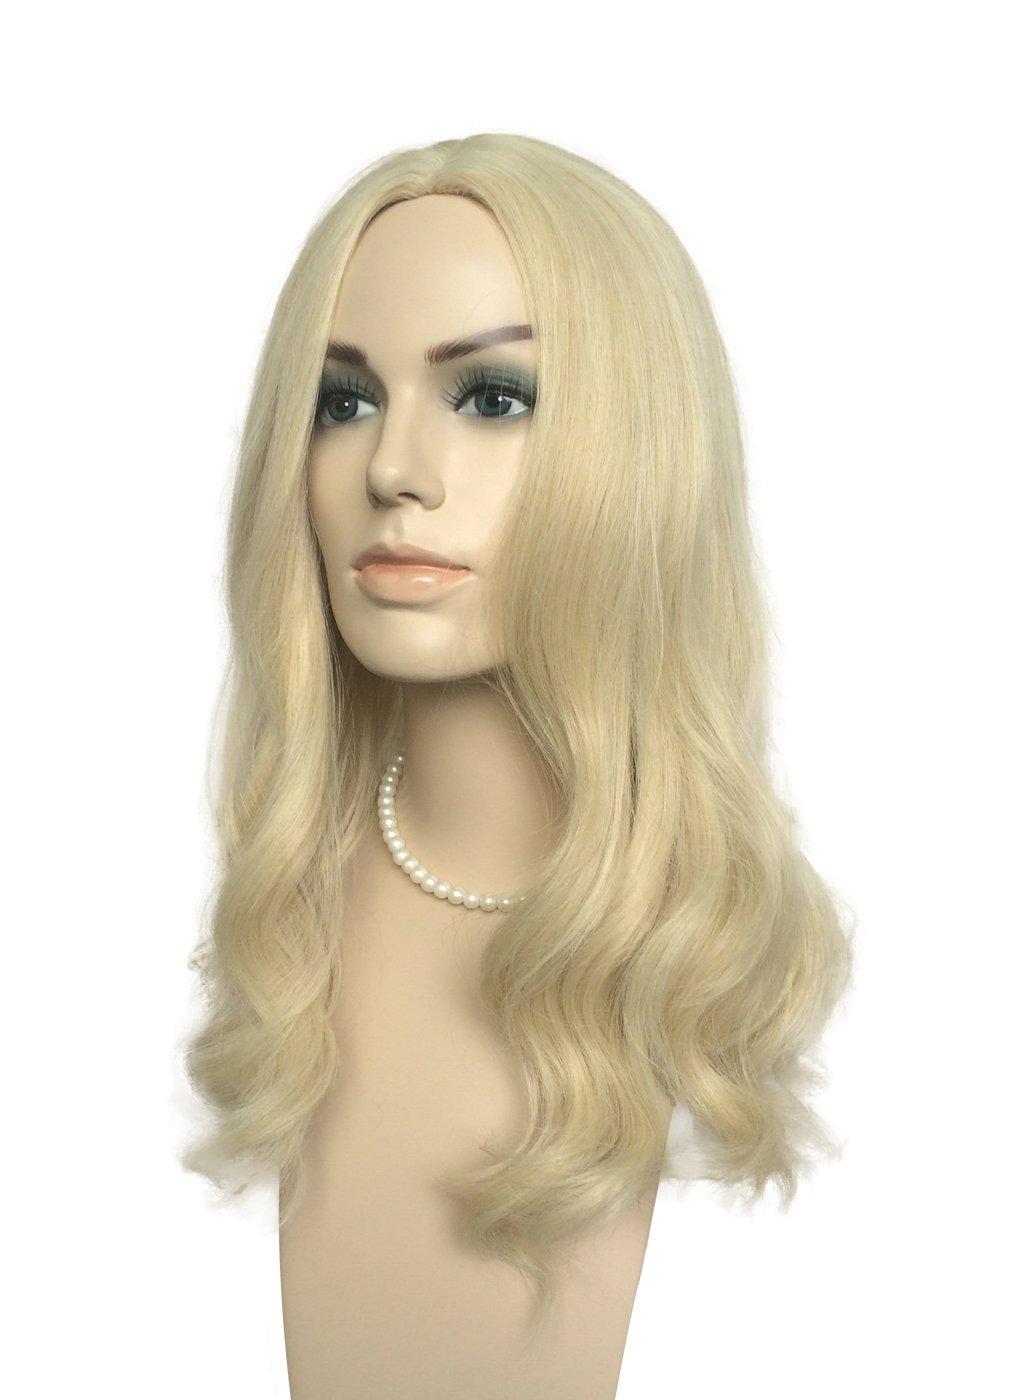 namecute Bleach peluca rubia larga sintético parte media peluca Pelucas + libre: Amazon.es: Belleza